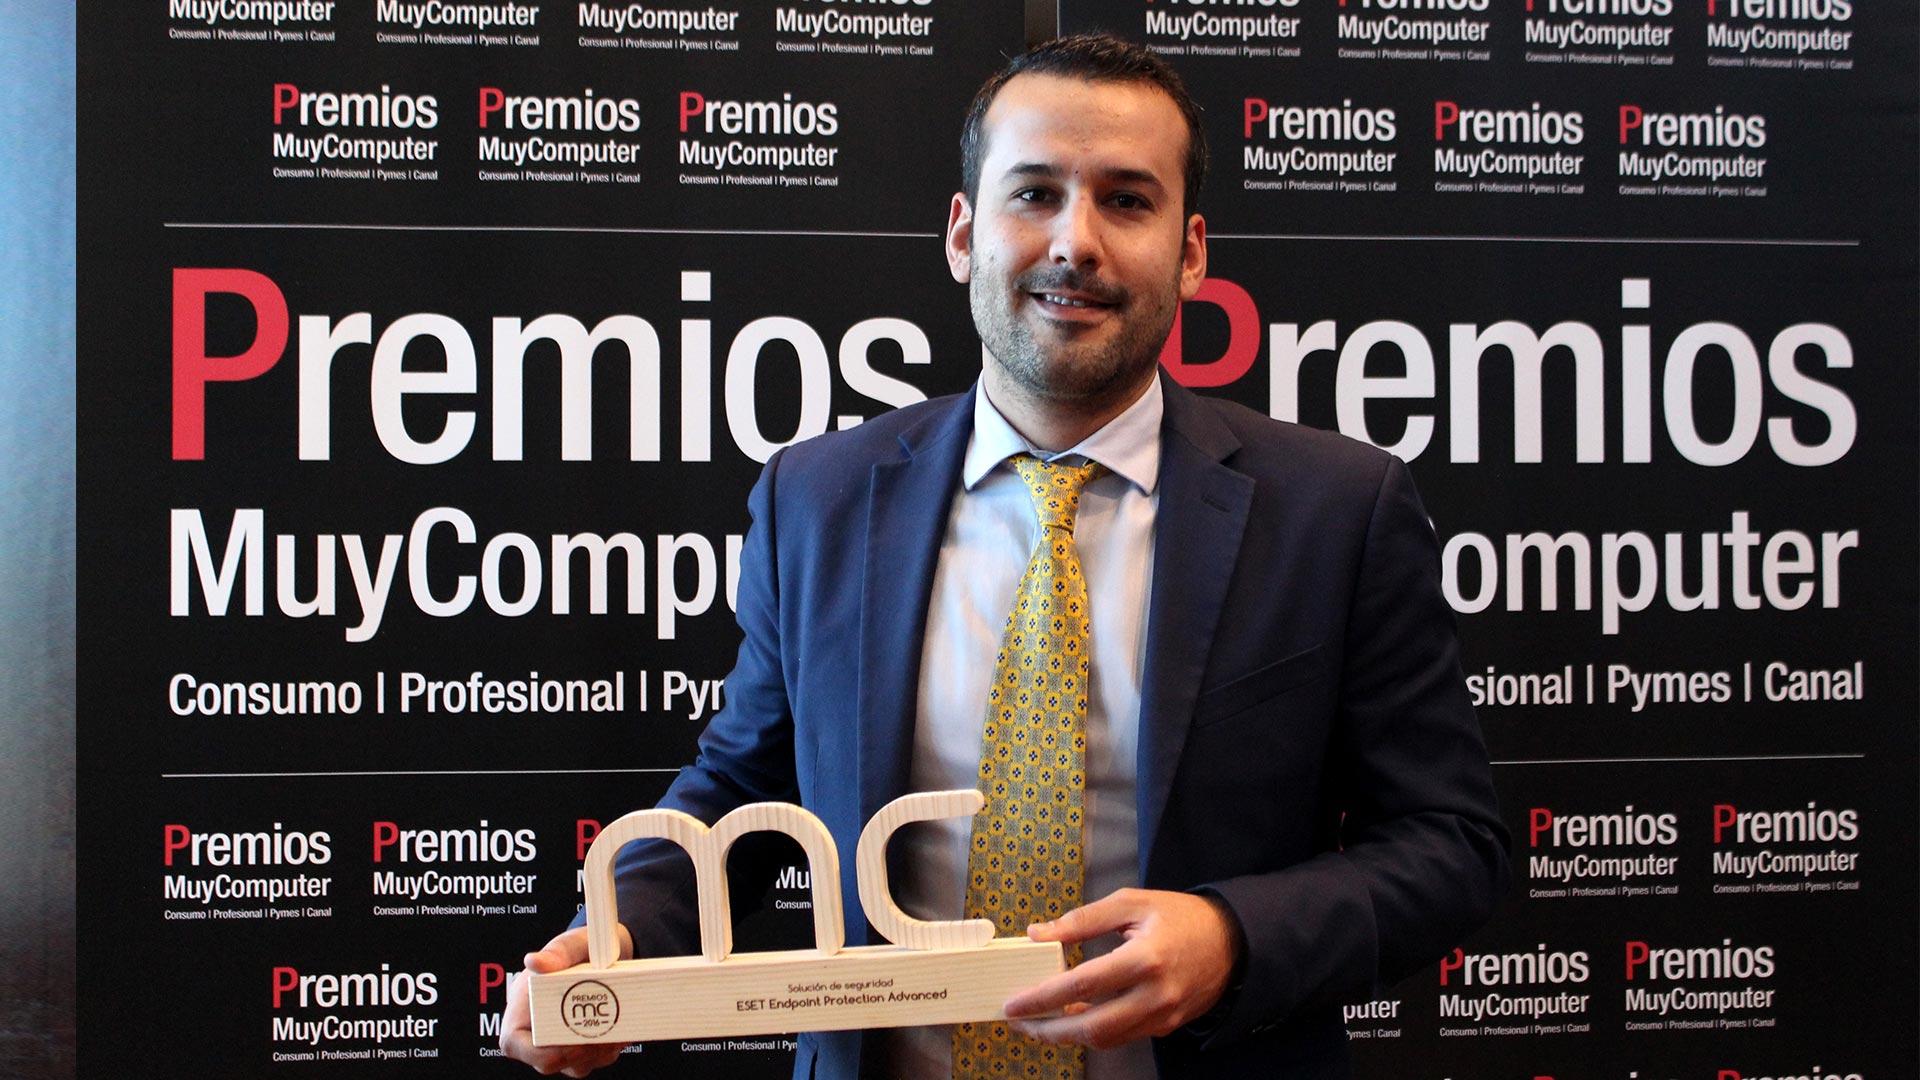 premiosmc2016-solucion-seguridad-eset